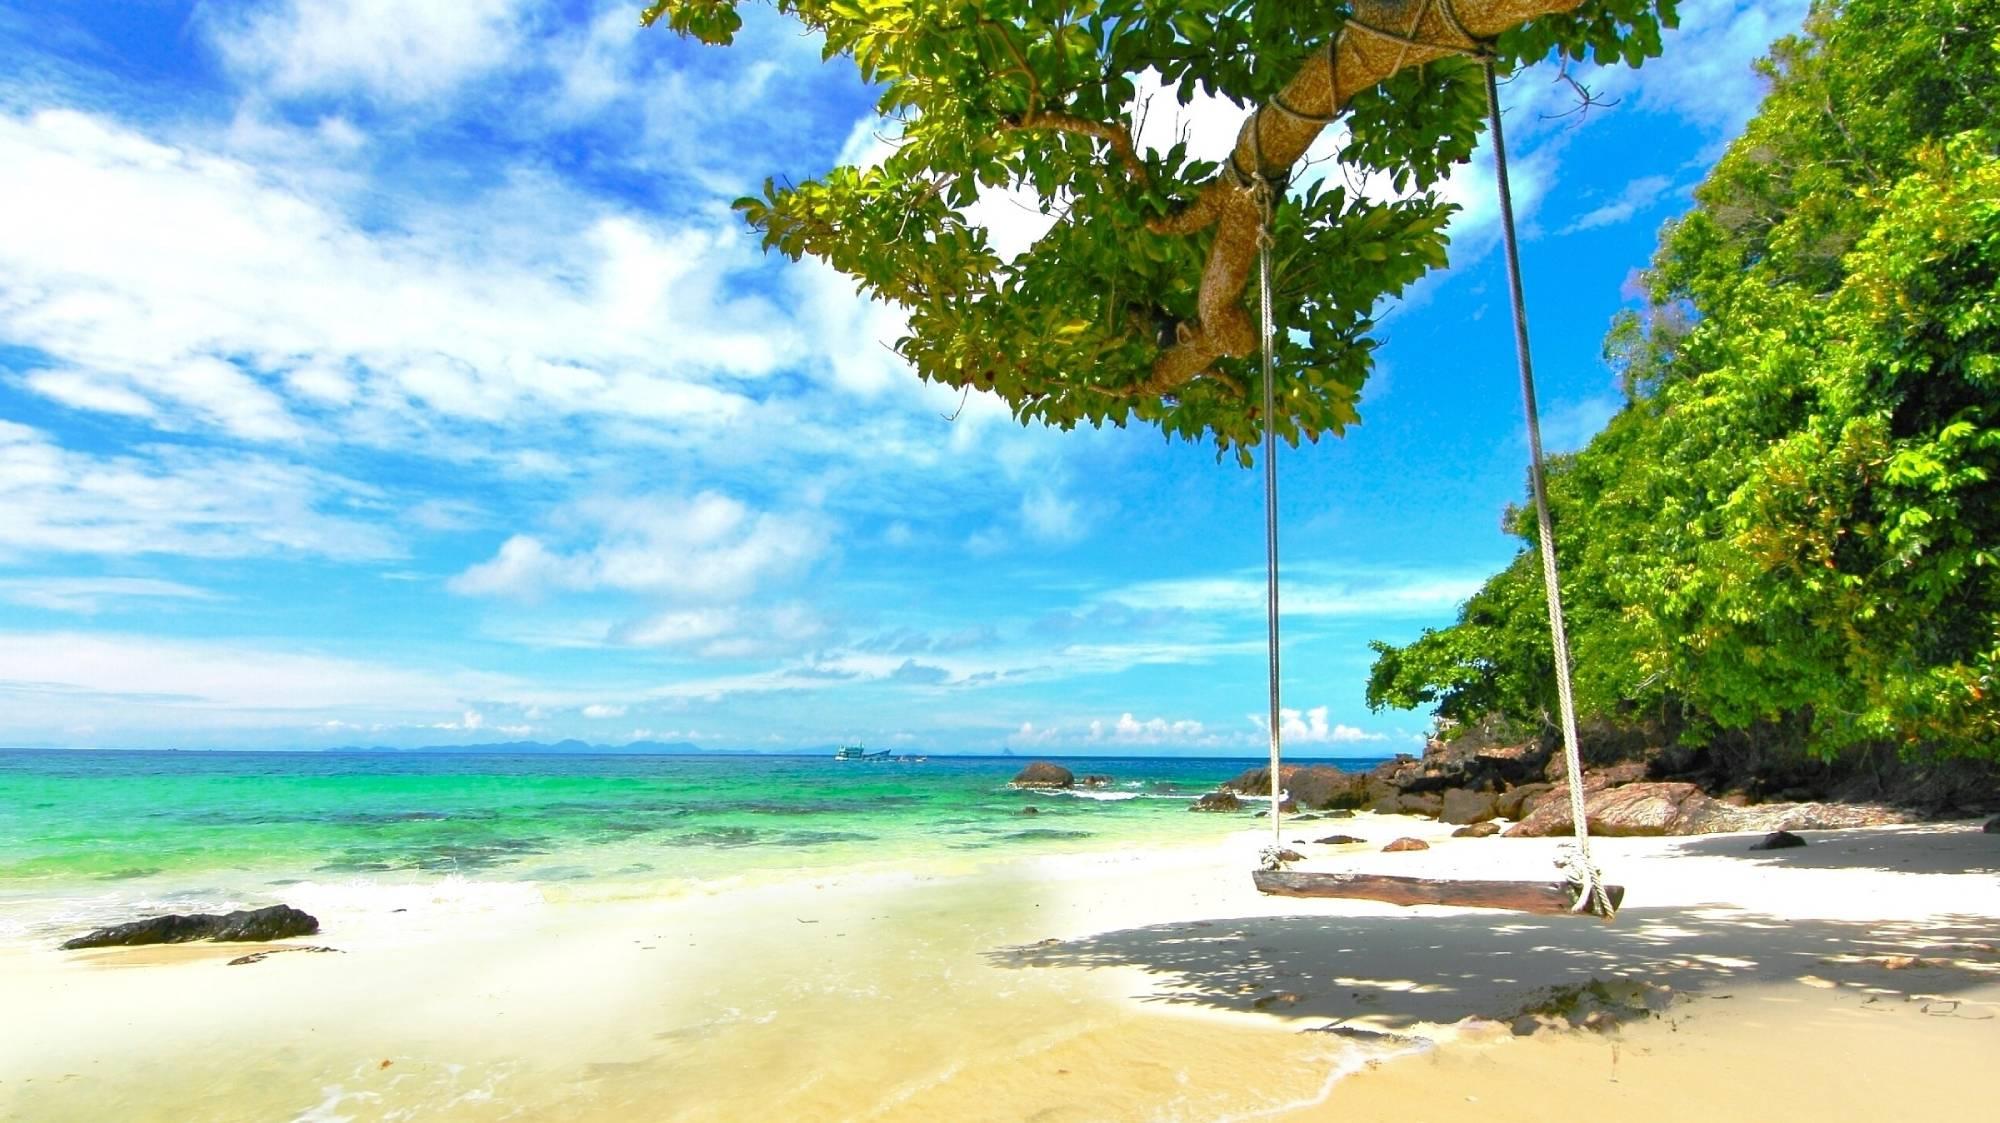 Phuket - Travel Blog